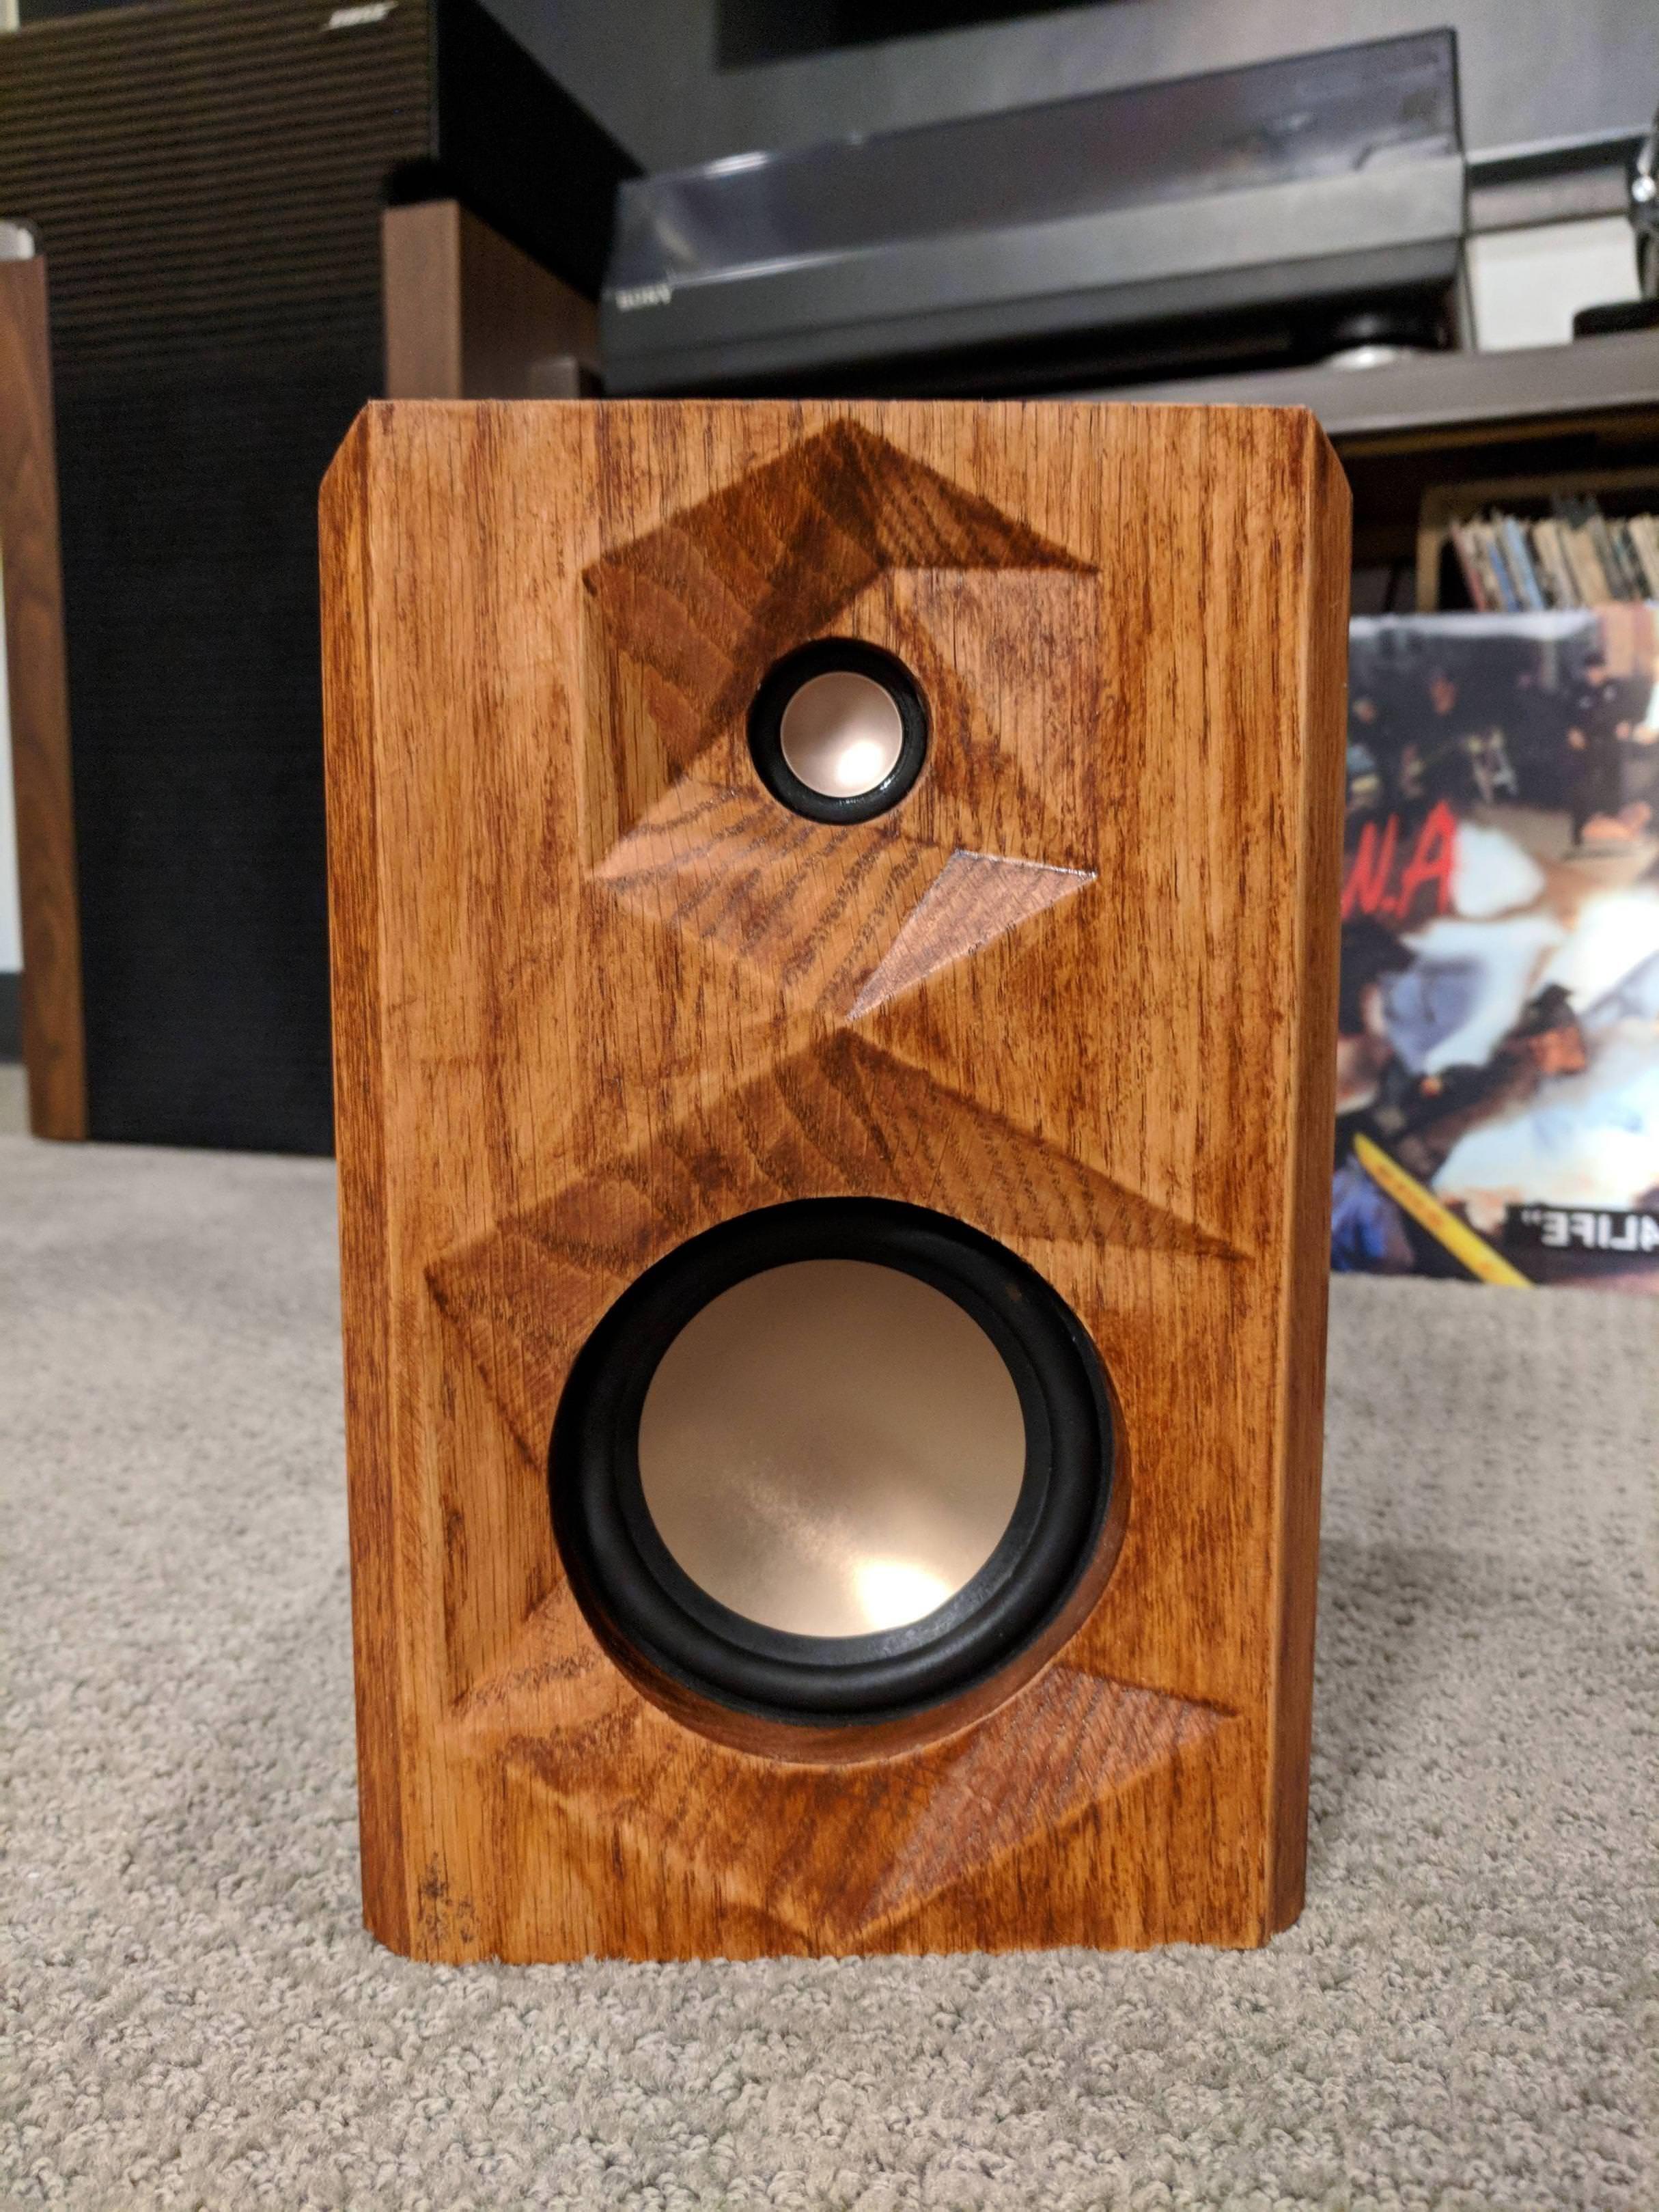 Bookshelf Speaker Build handmade crafts HowTo DIY